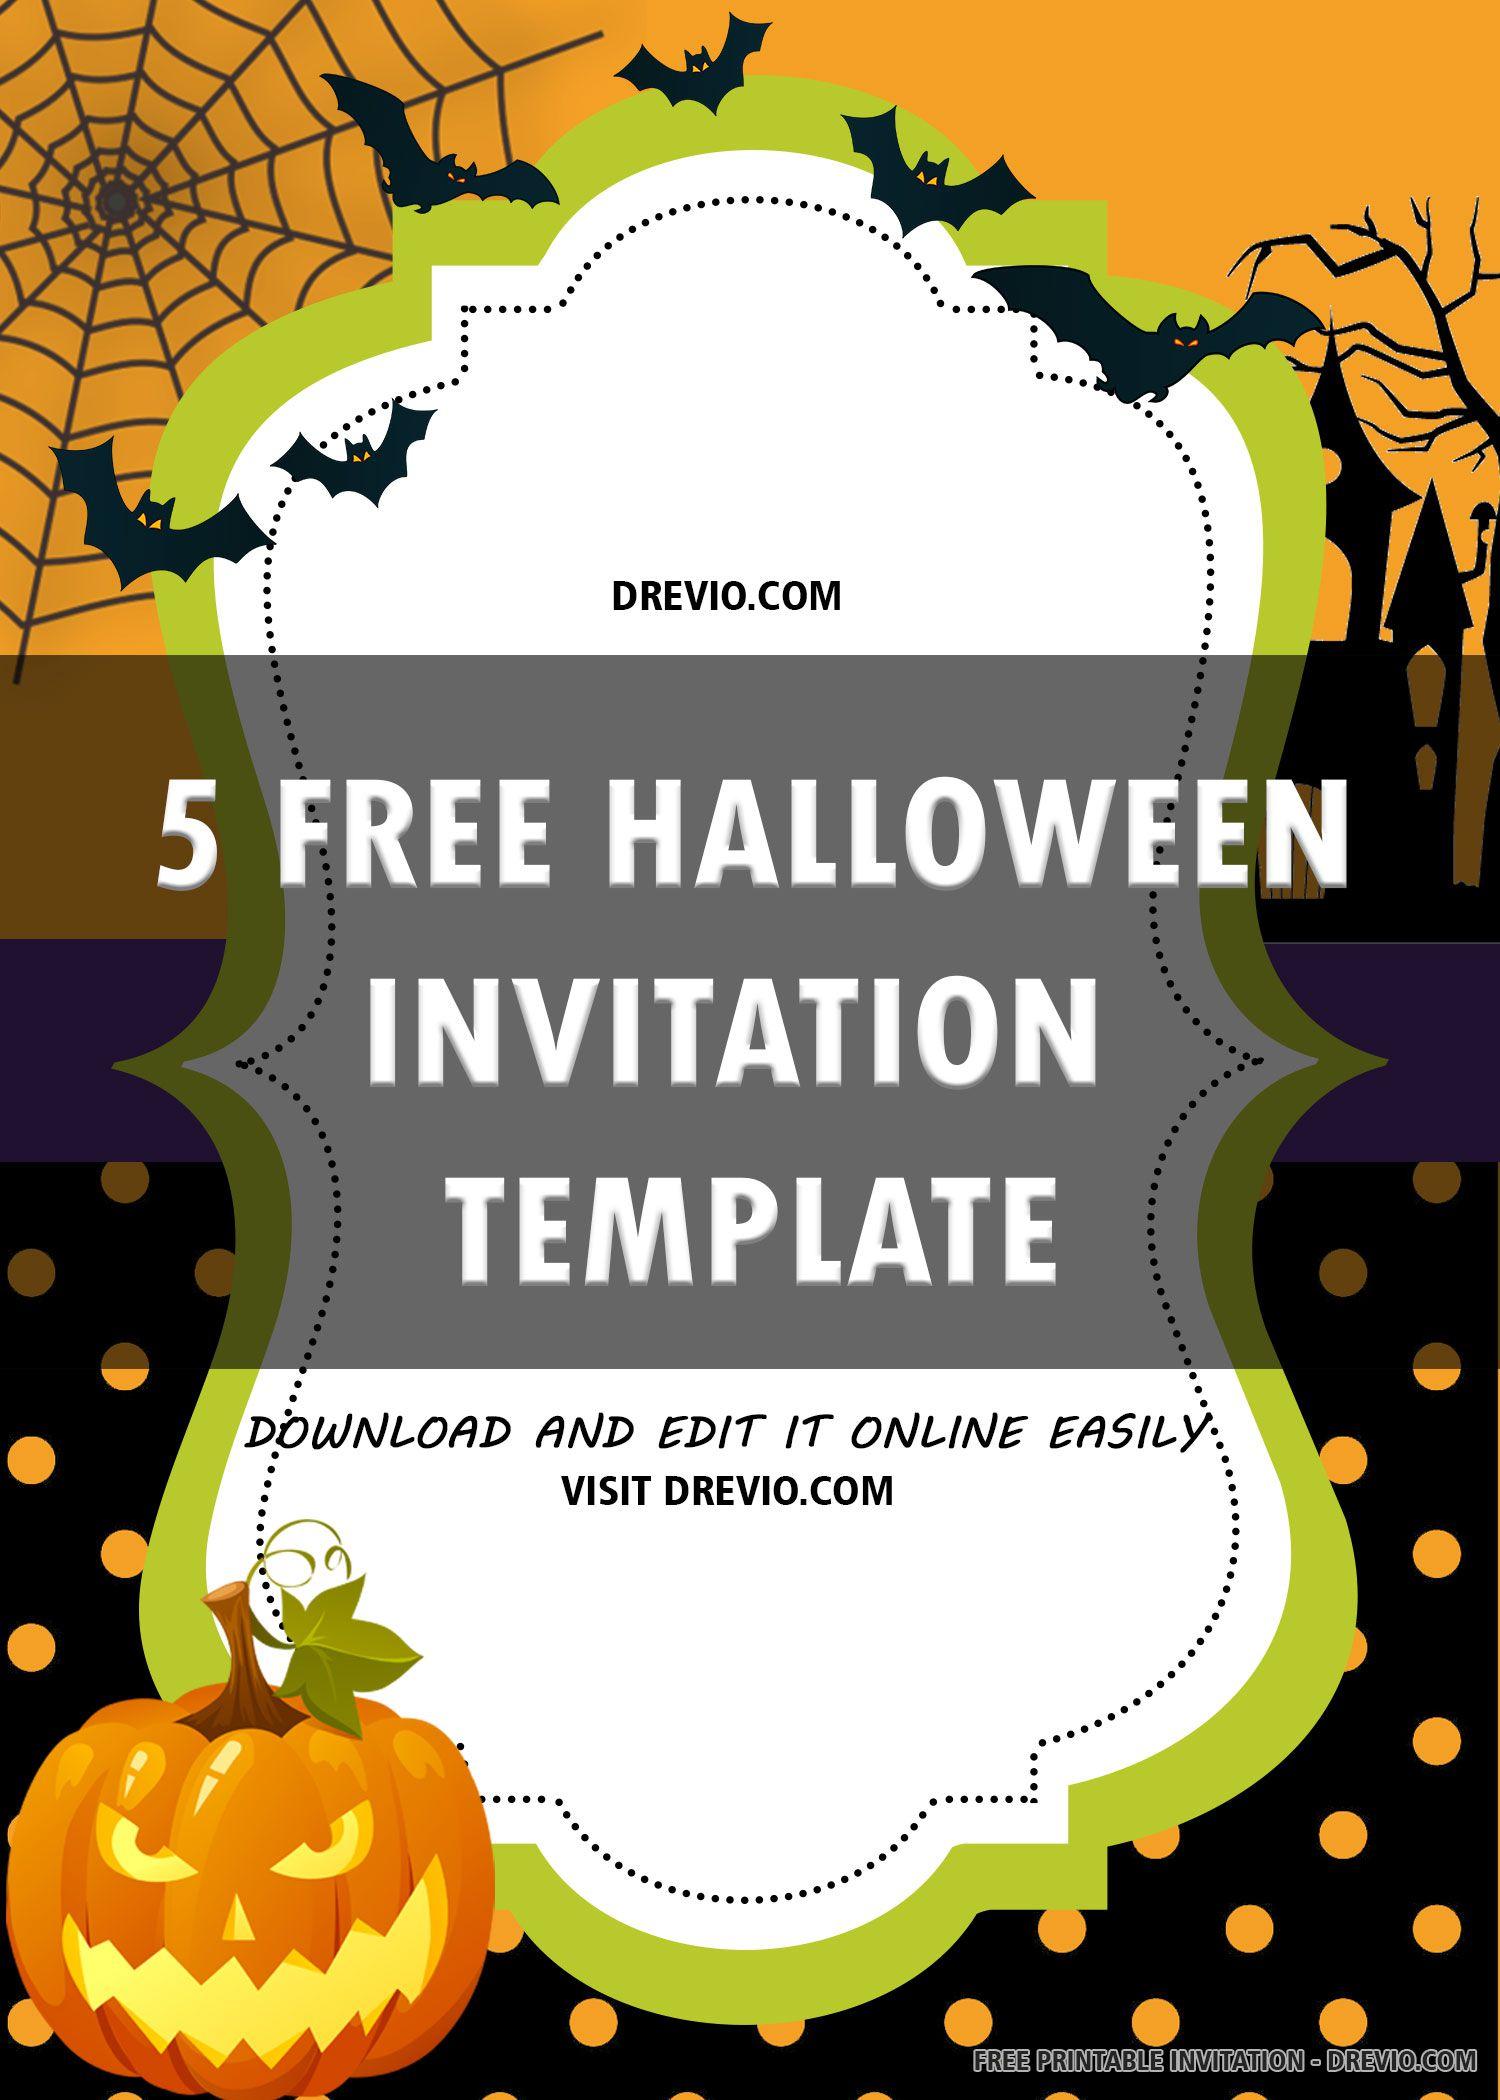 007 Unusual Free Halloween Invitation Template High Resolution  Templates Online Printable Birthday Party WeddingFull